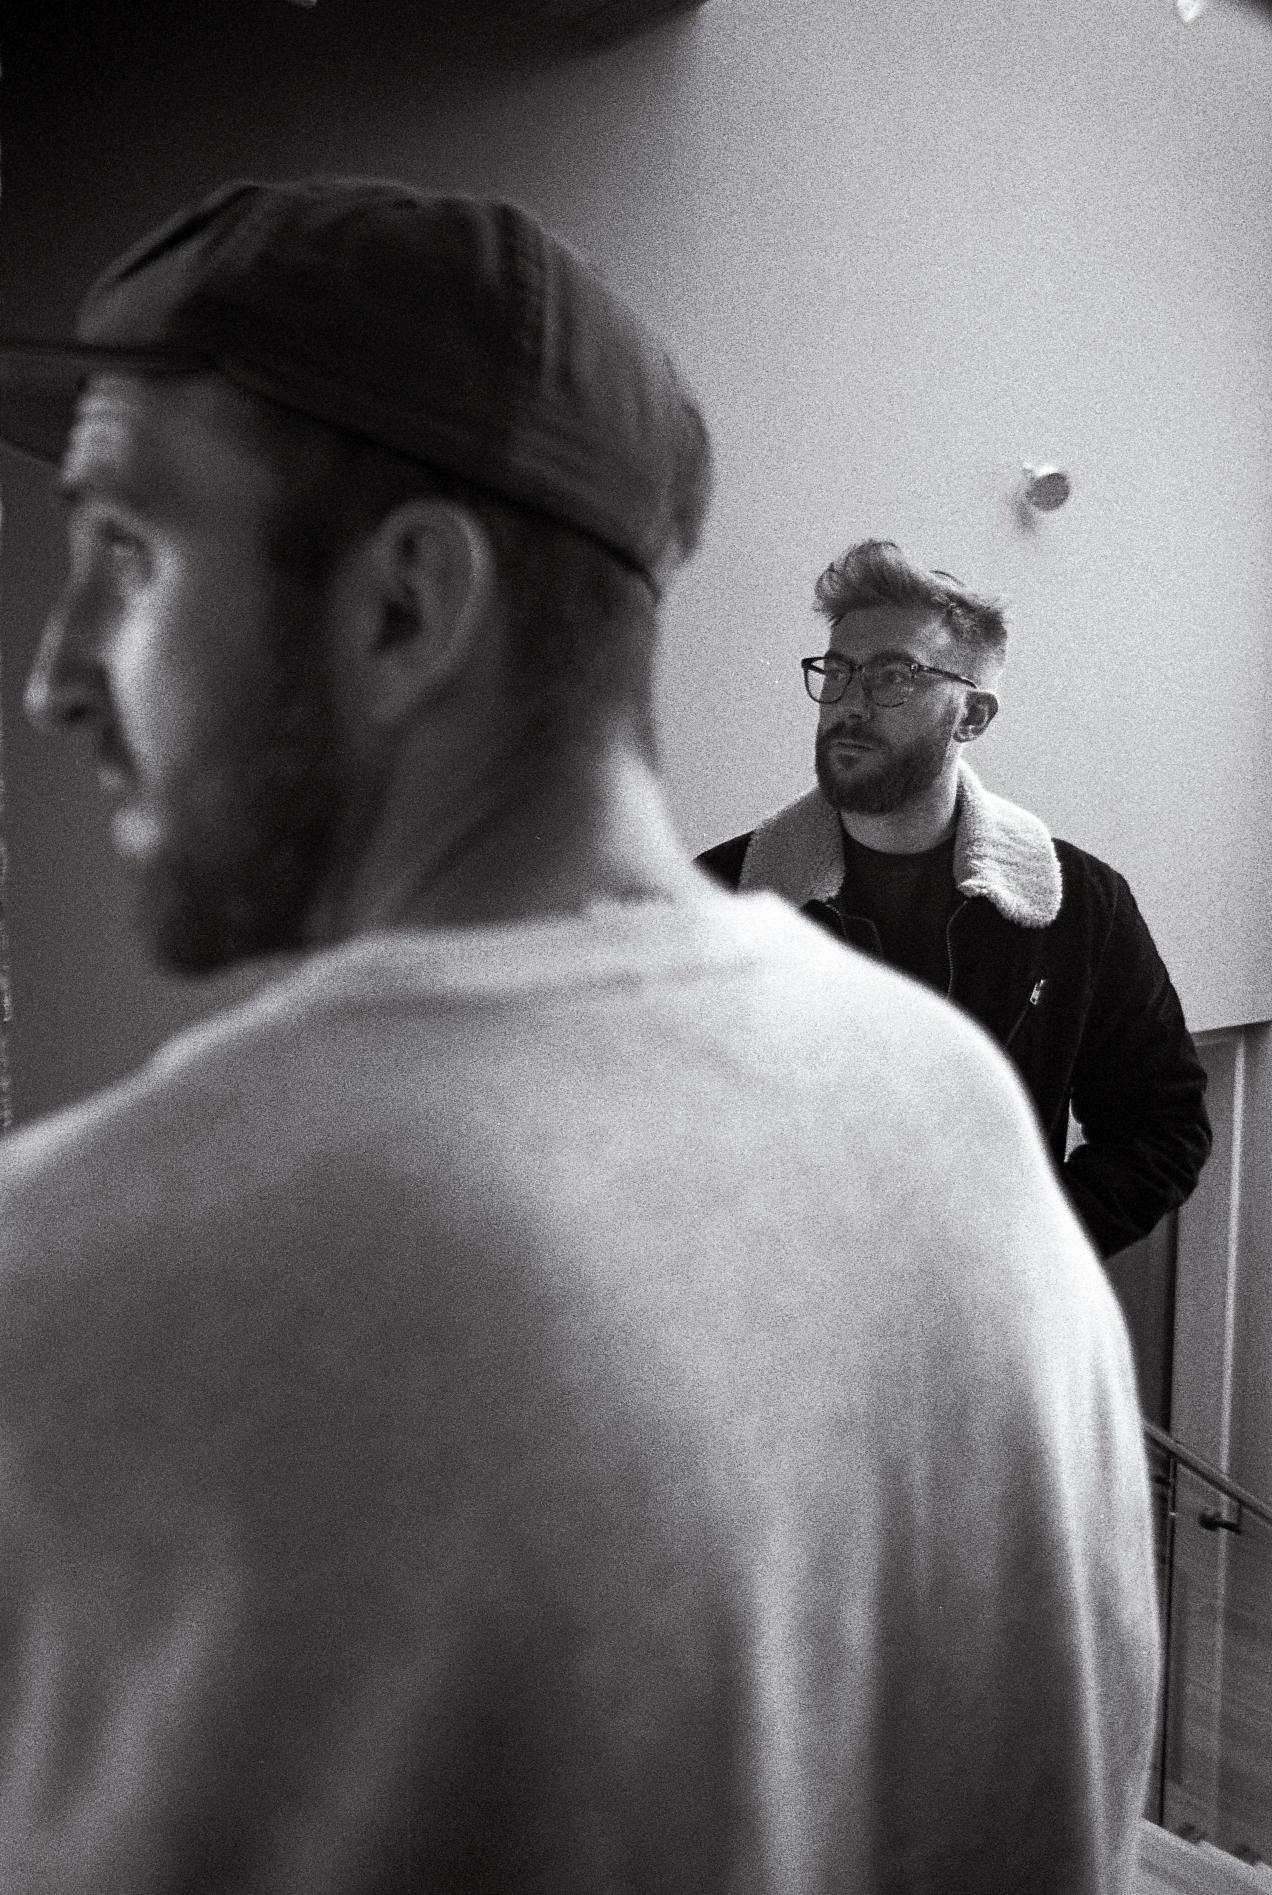 Alex looking mildly intrigued.